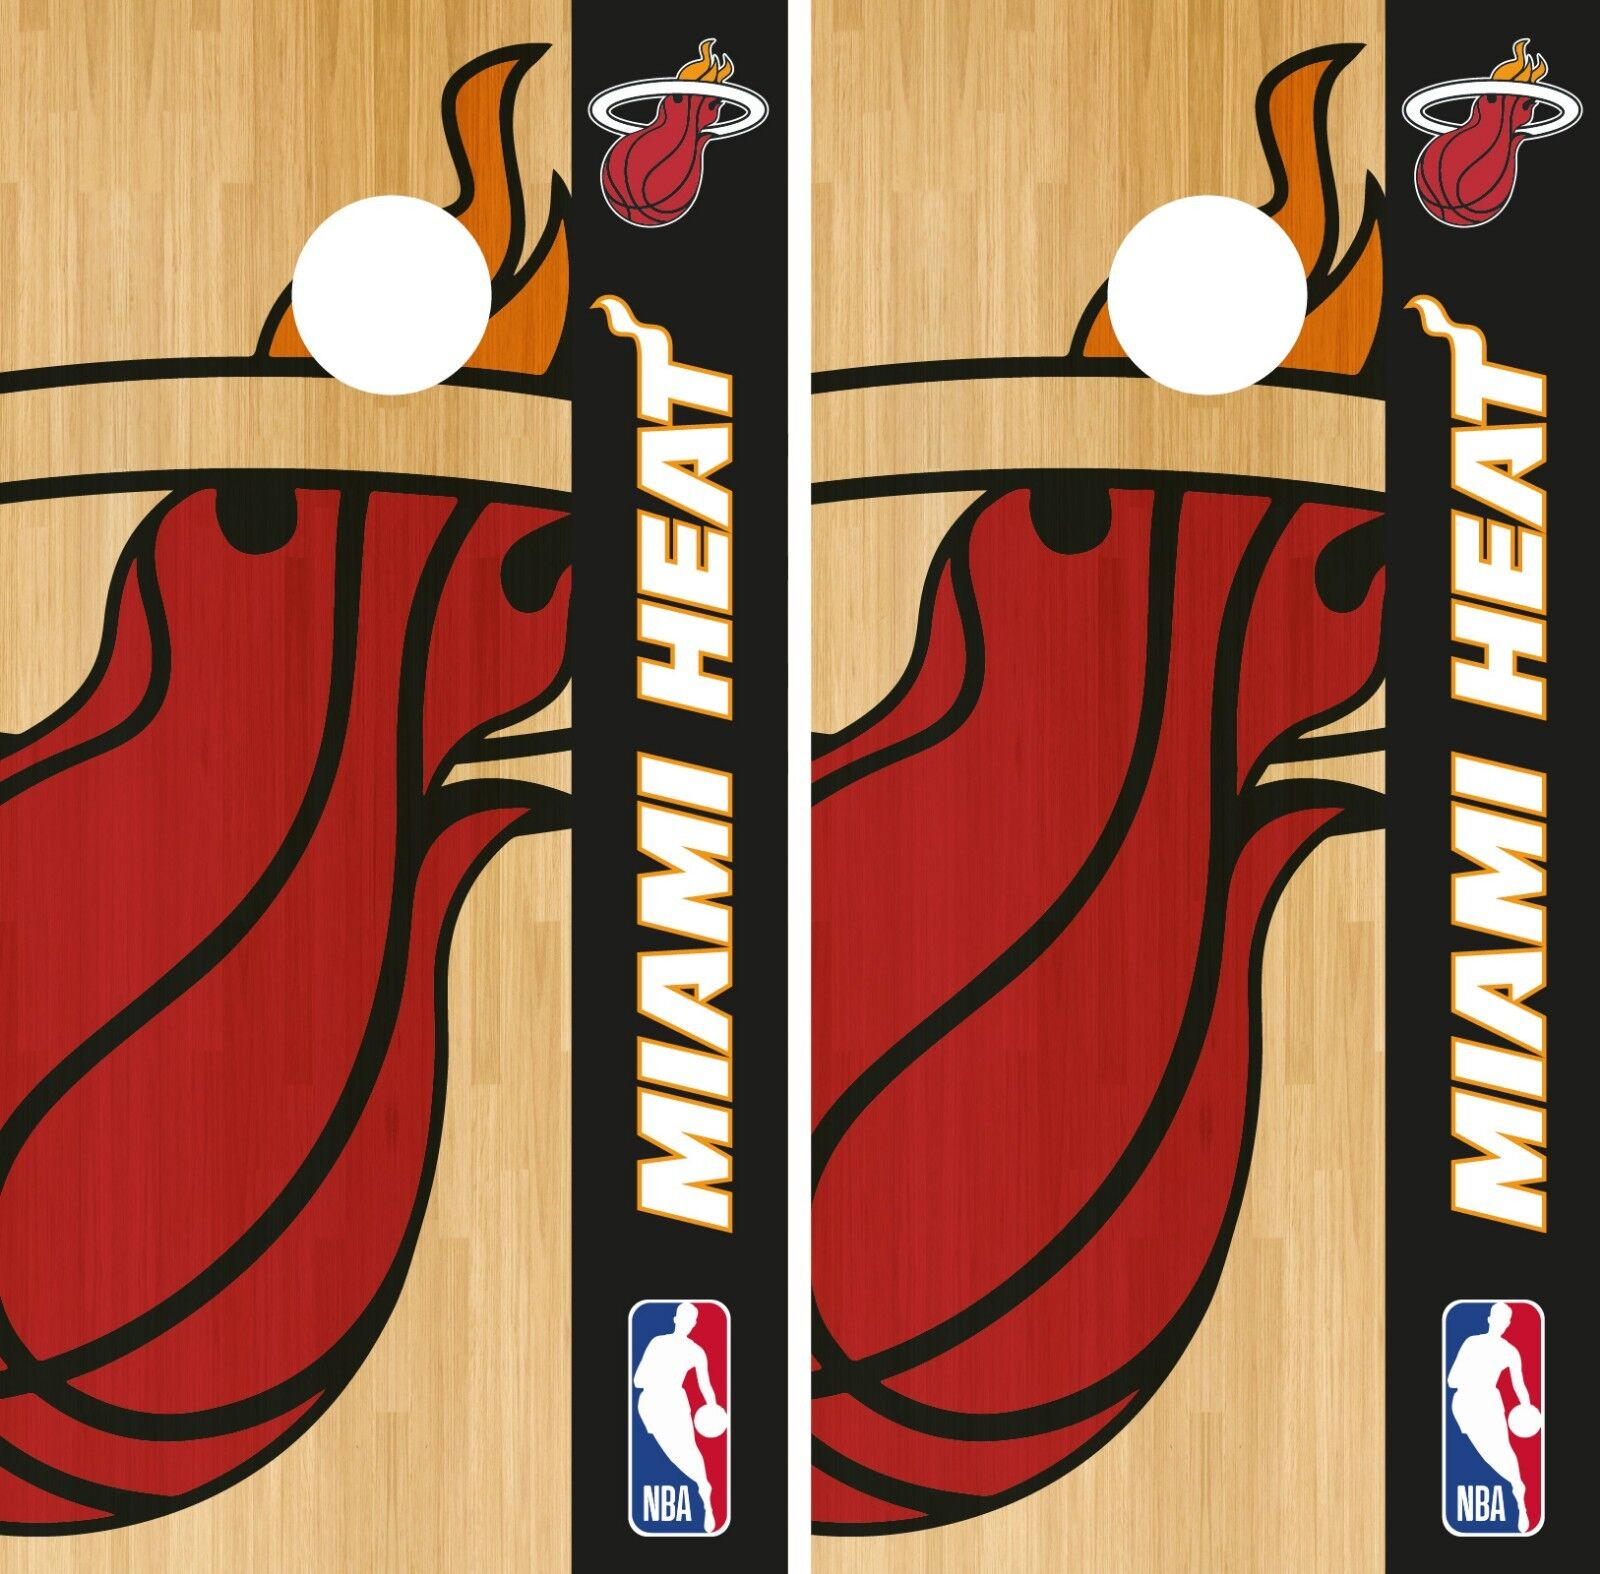 Miami  Heat Cornhole Wrap NBA Logo Game Skin Board Set Vinyl Decal CO643  80% off